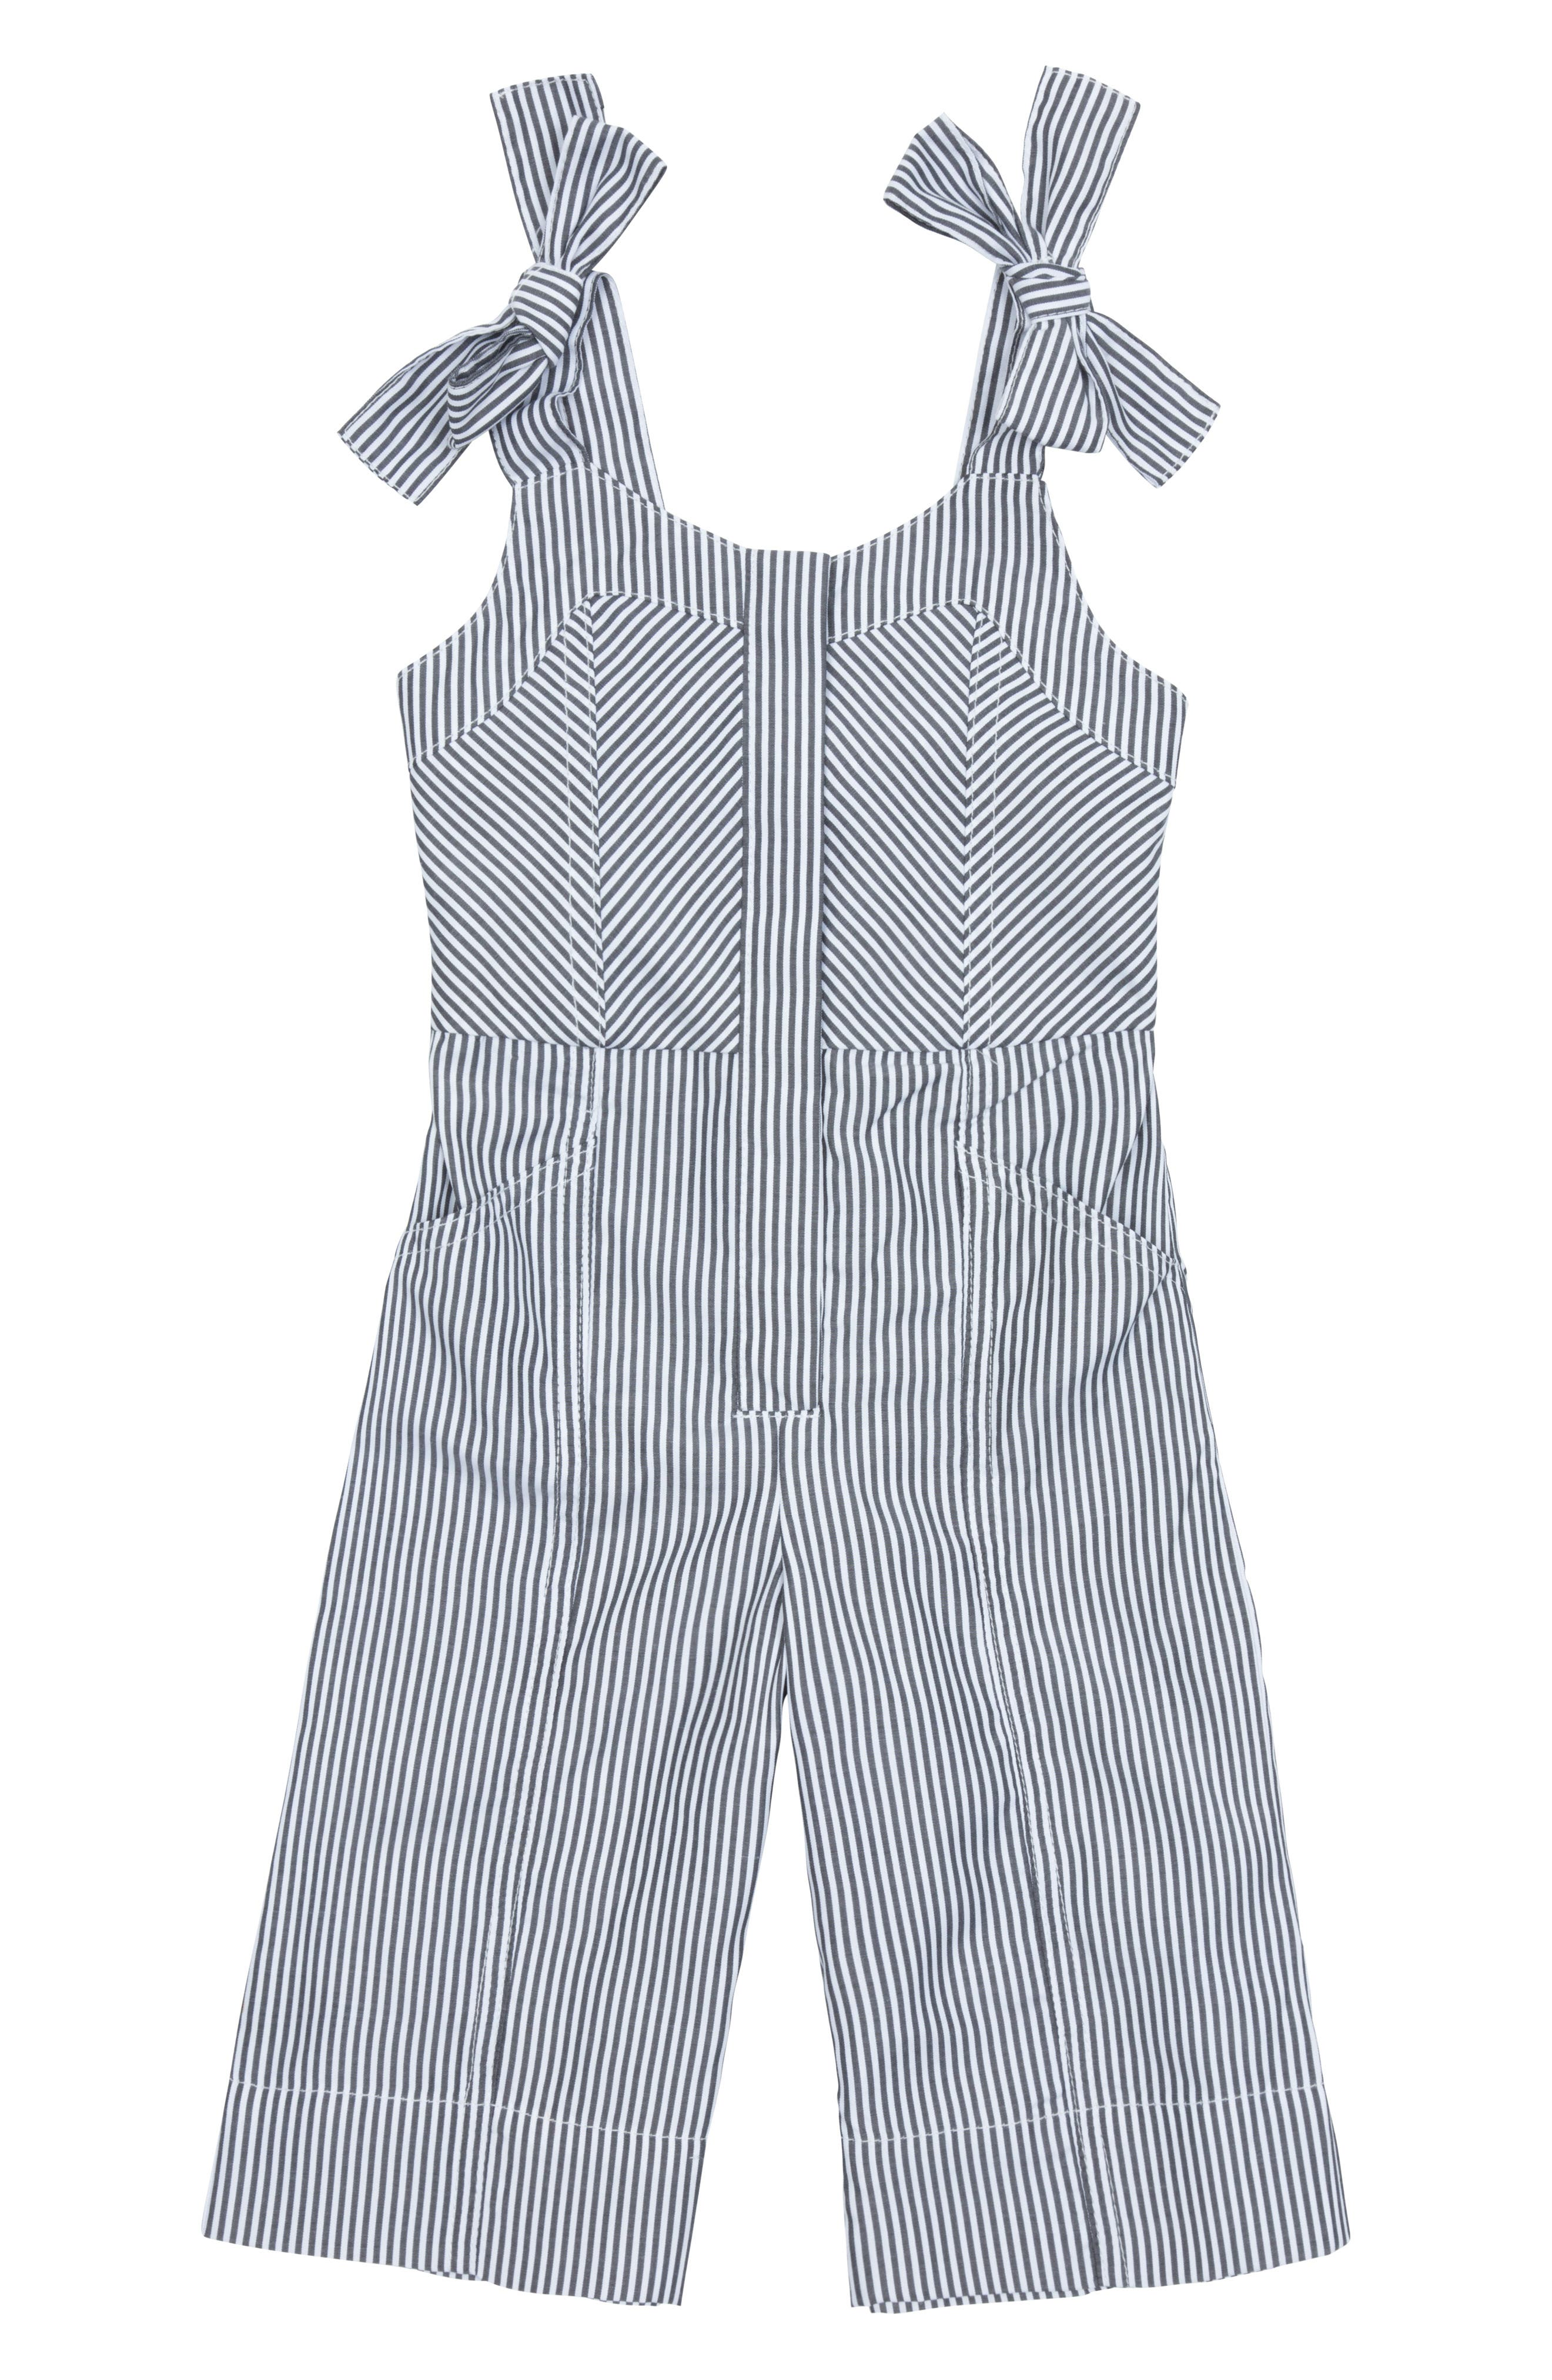 Toddler Girls Habitual Girl Whitney Stripe Jumpsuit Size 3T  Grey